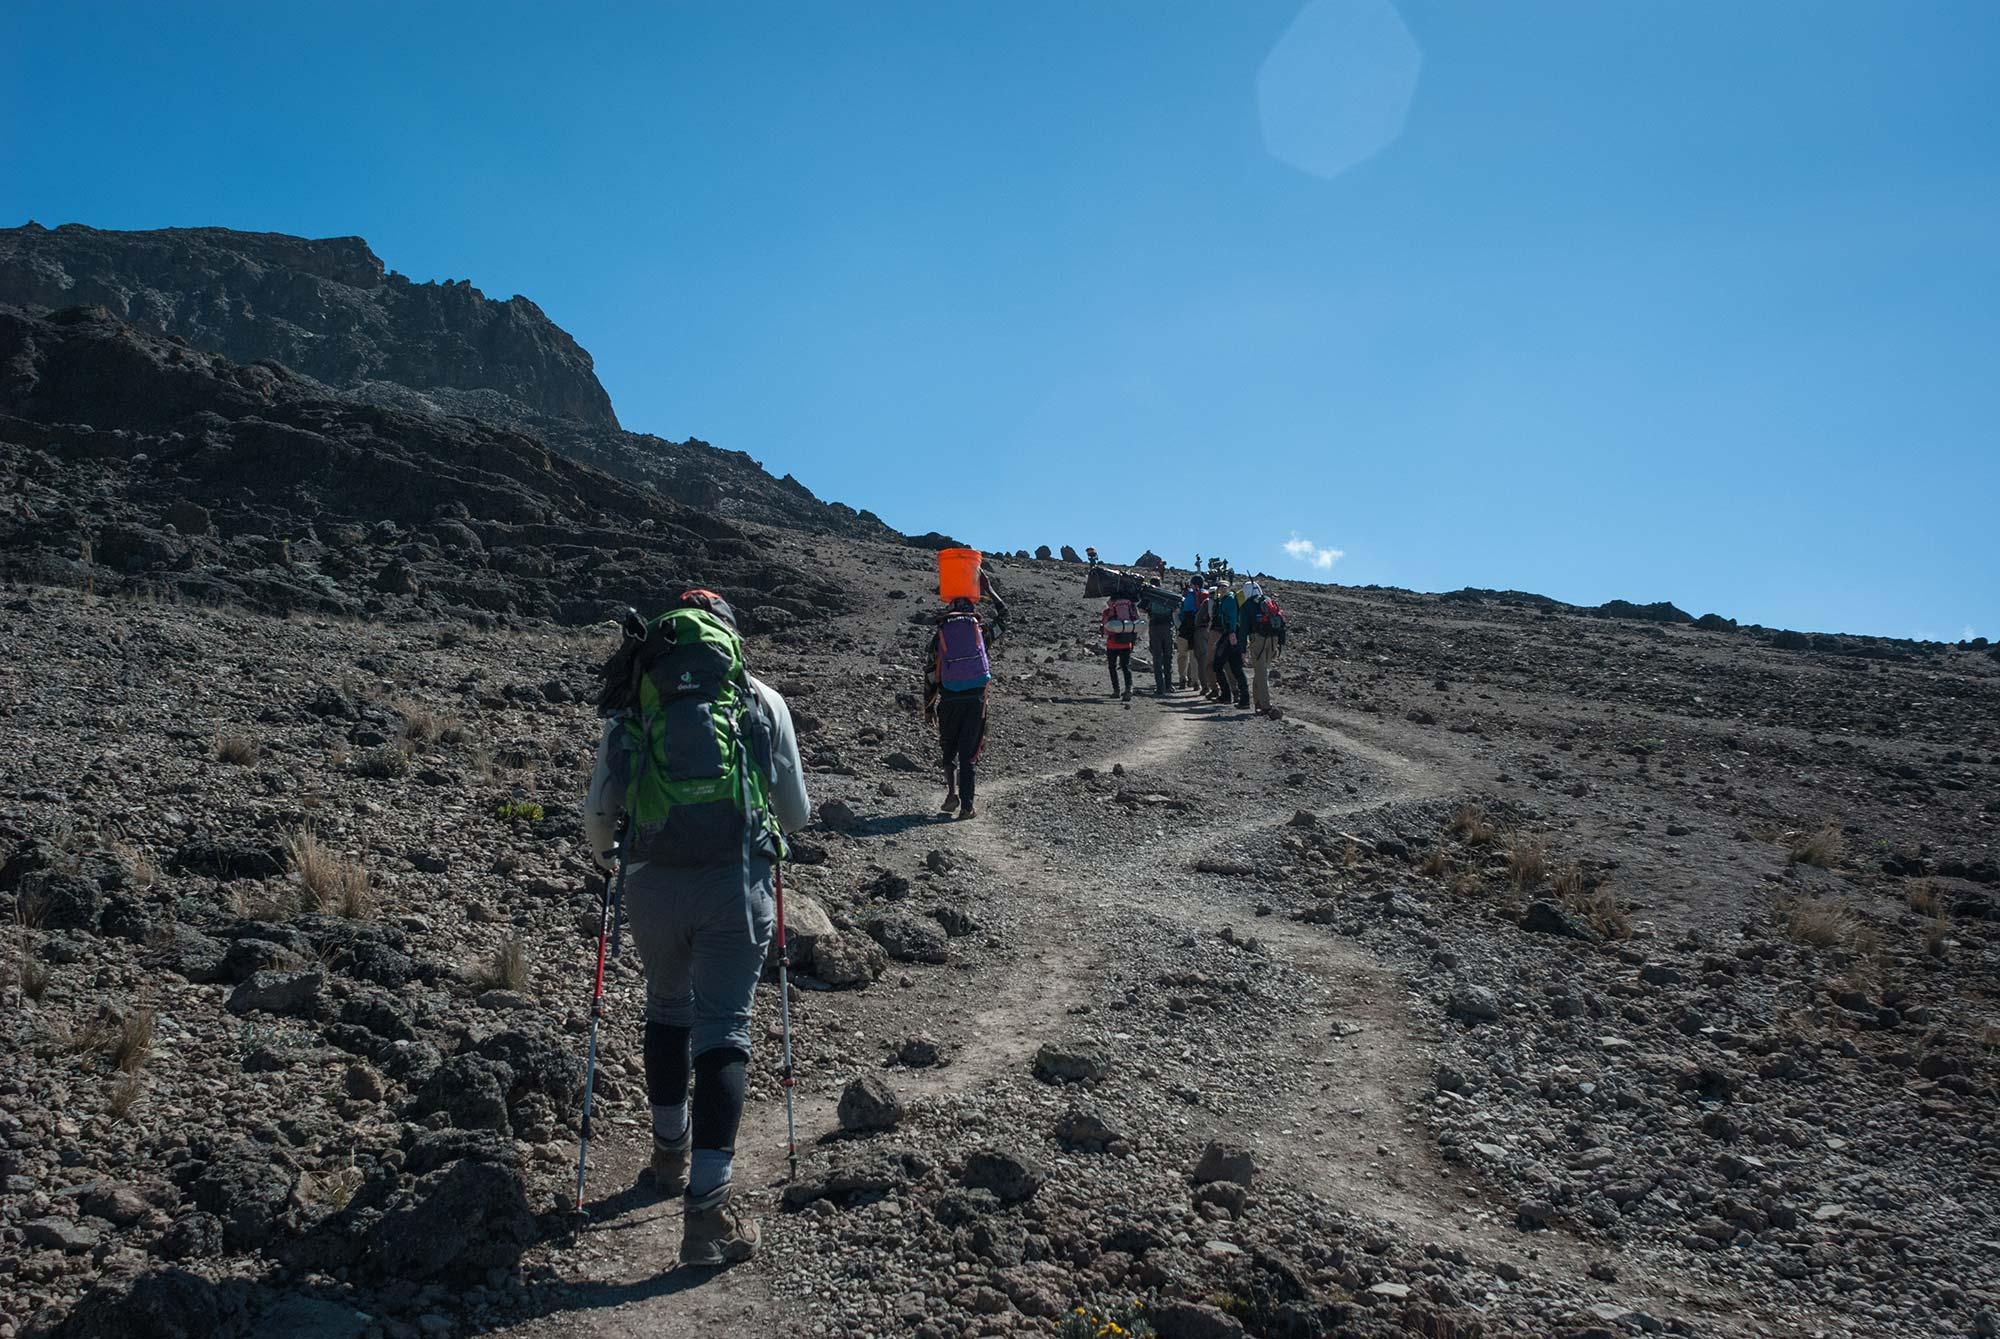 D6-27-easy-hiking-welcome-karanga-to-barufu-camp-kilimanjaro.jpg